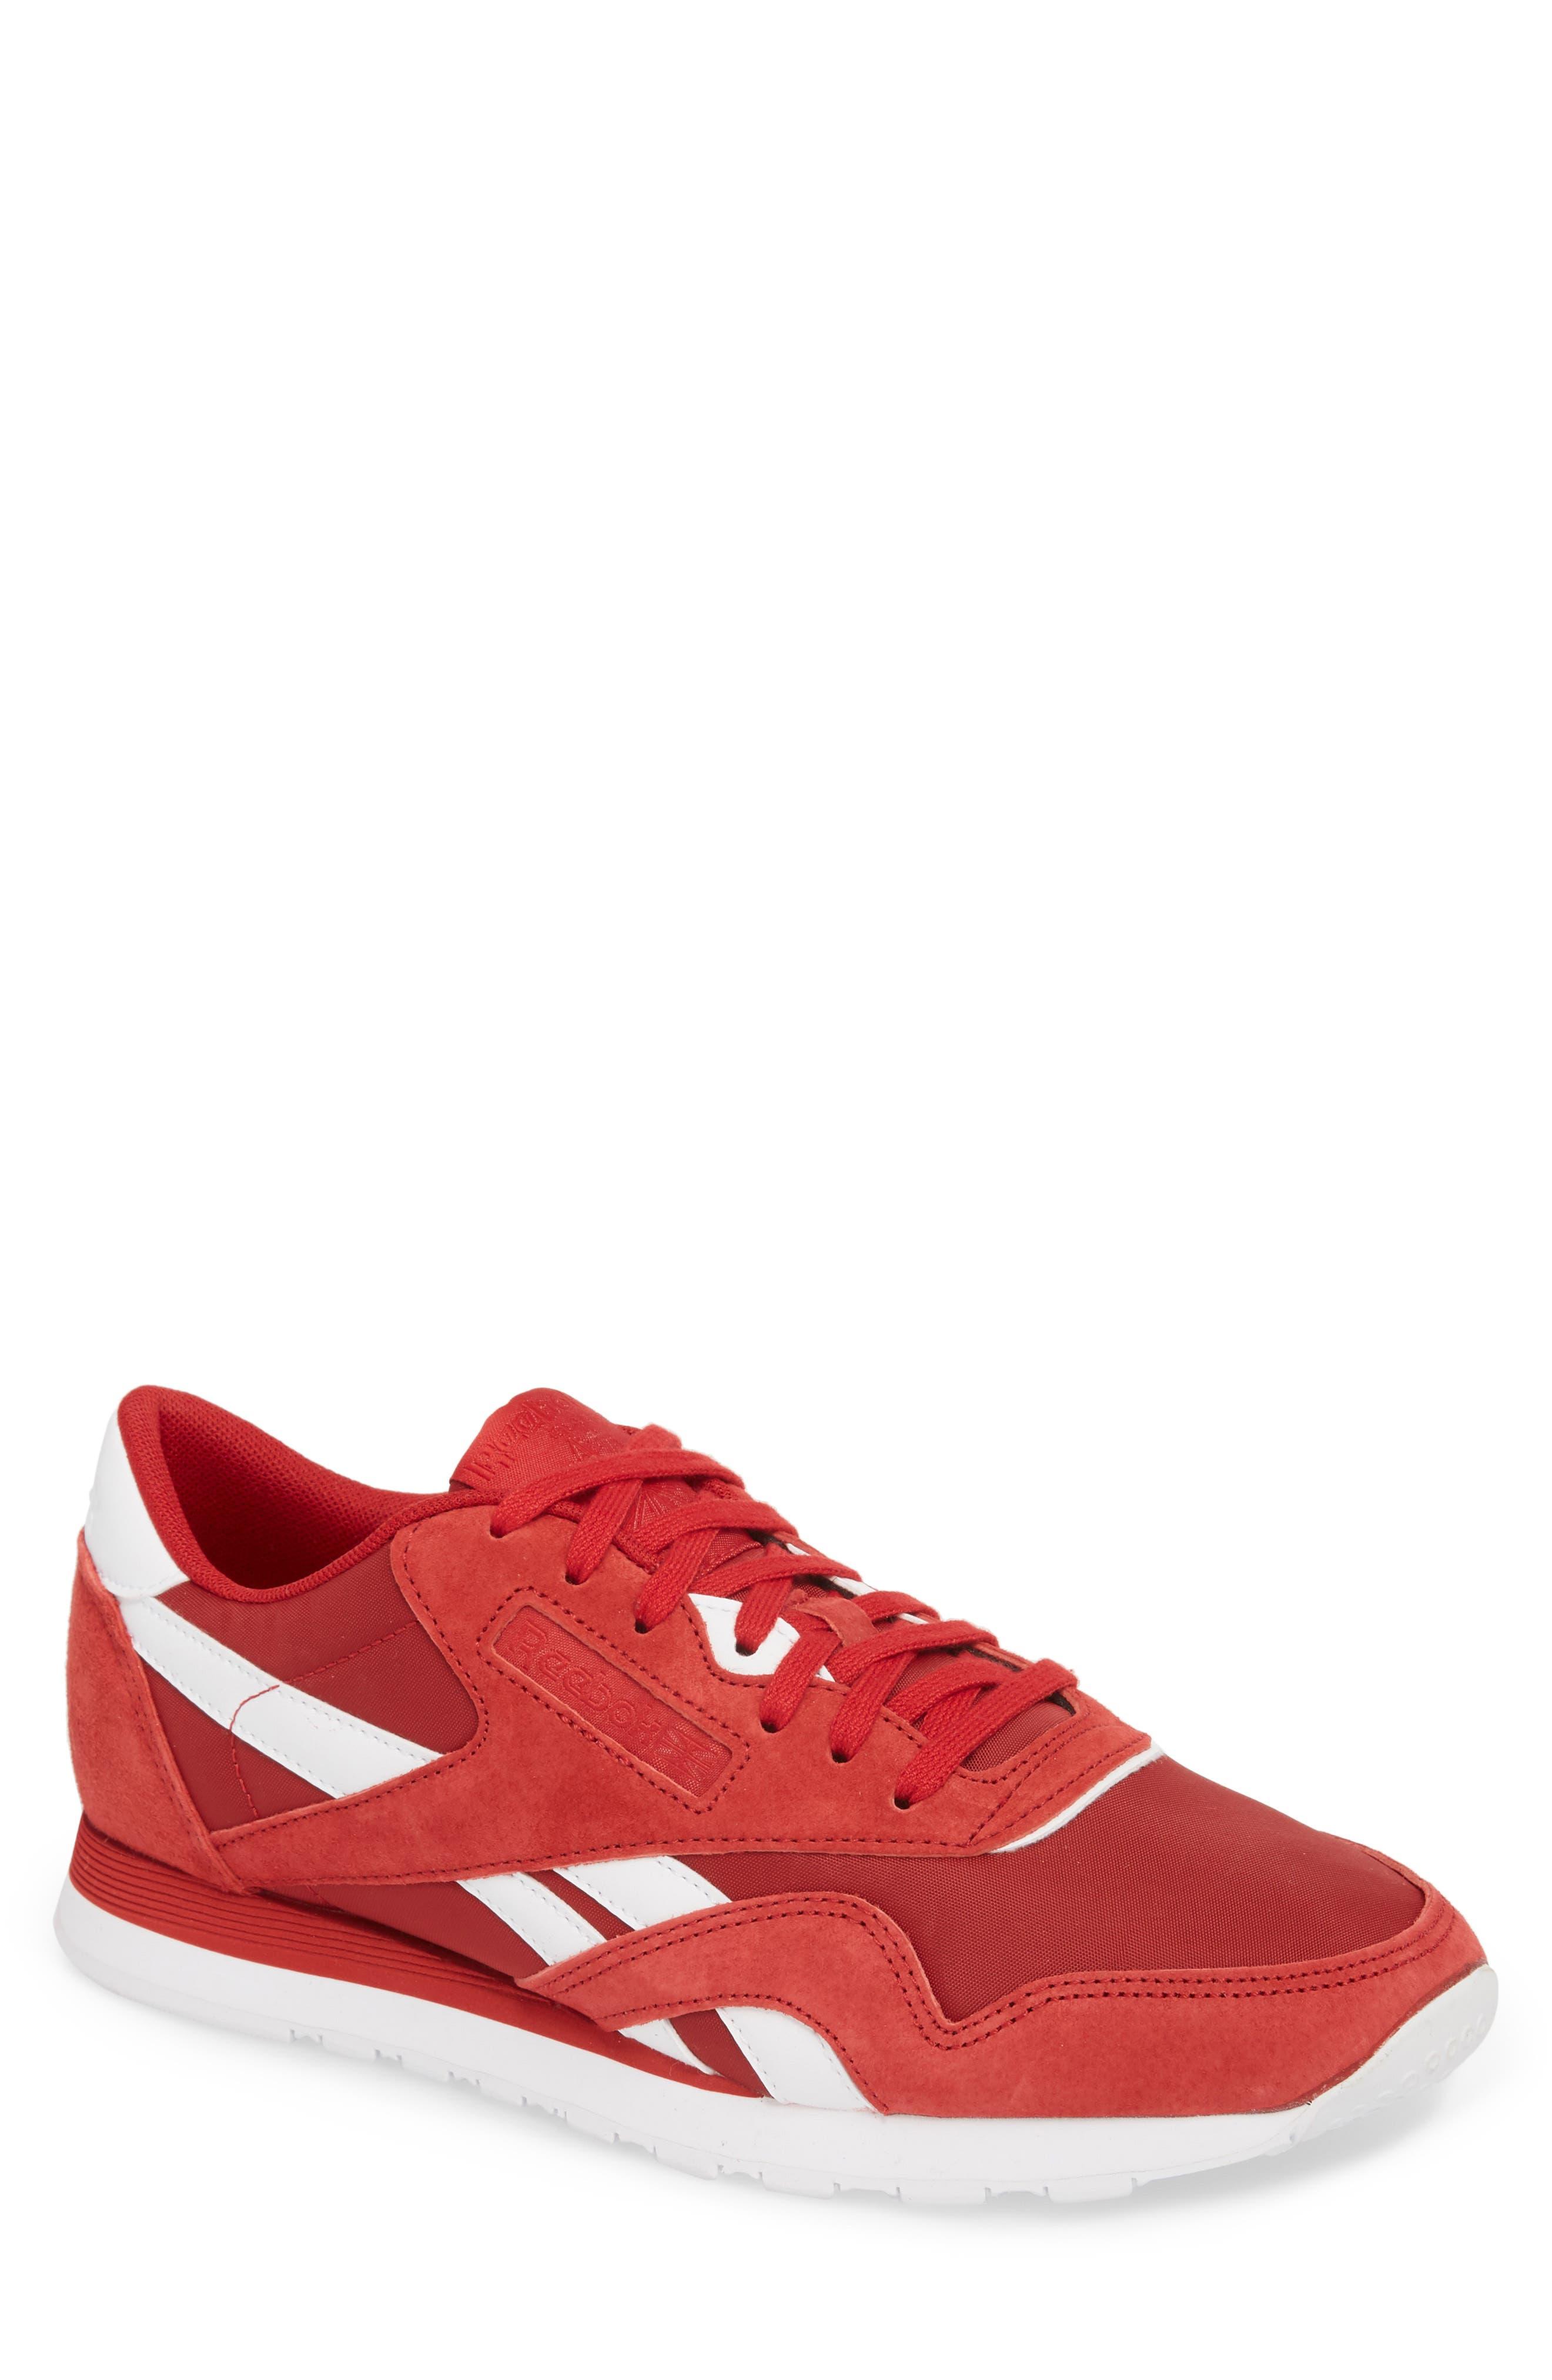 Classic Nylon PN Sneaker,                         Main,                         color, Power Red/ White